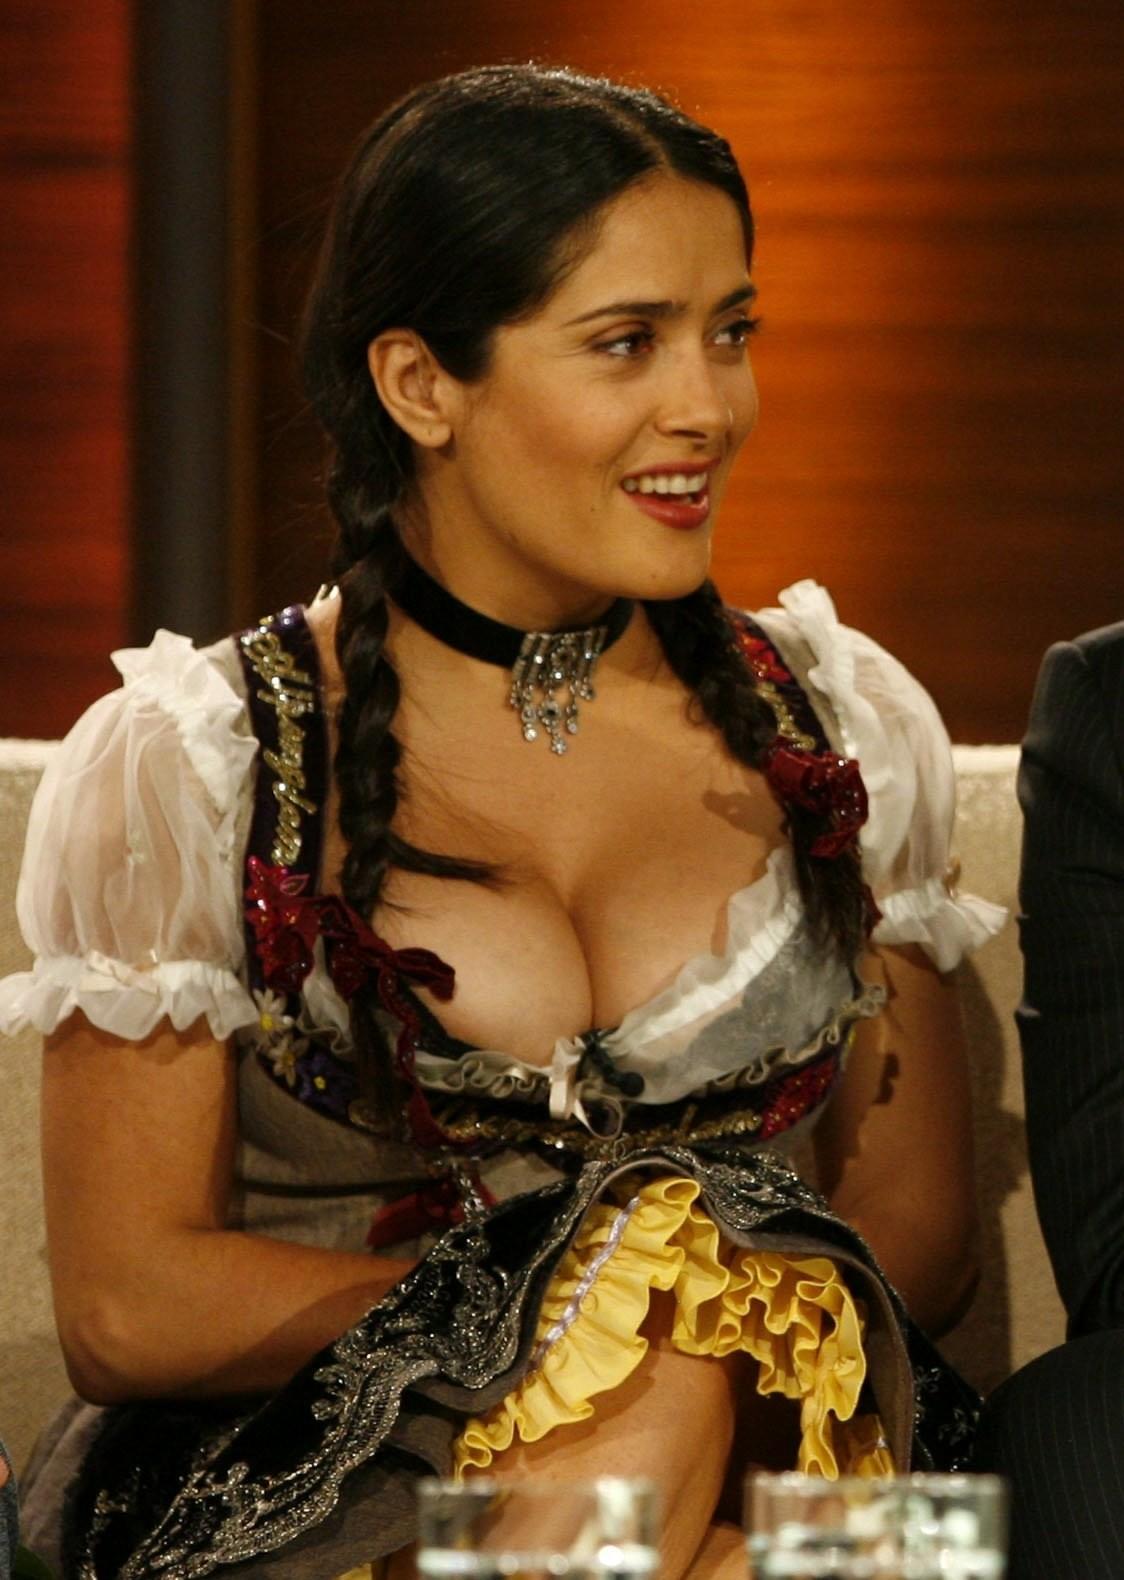 salma hayek nipples